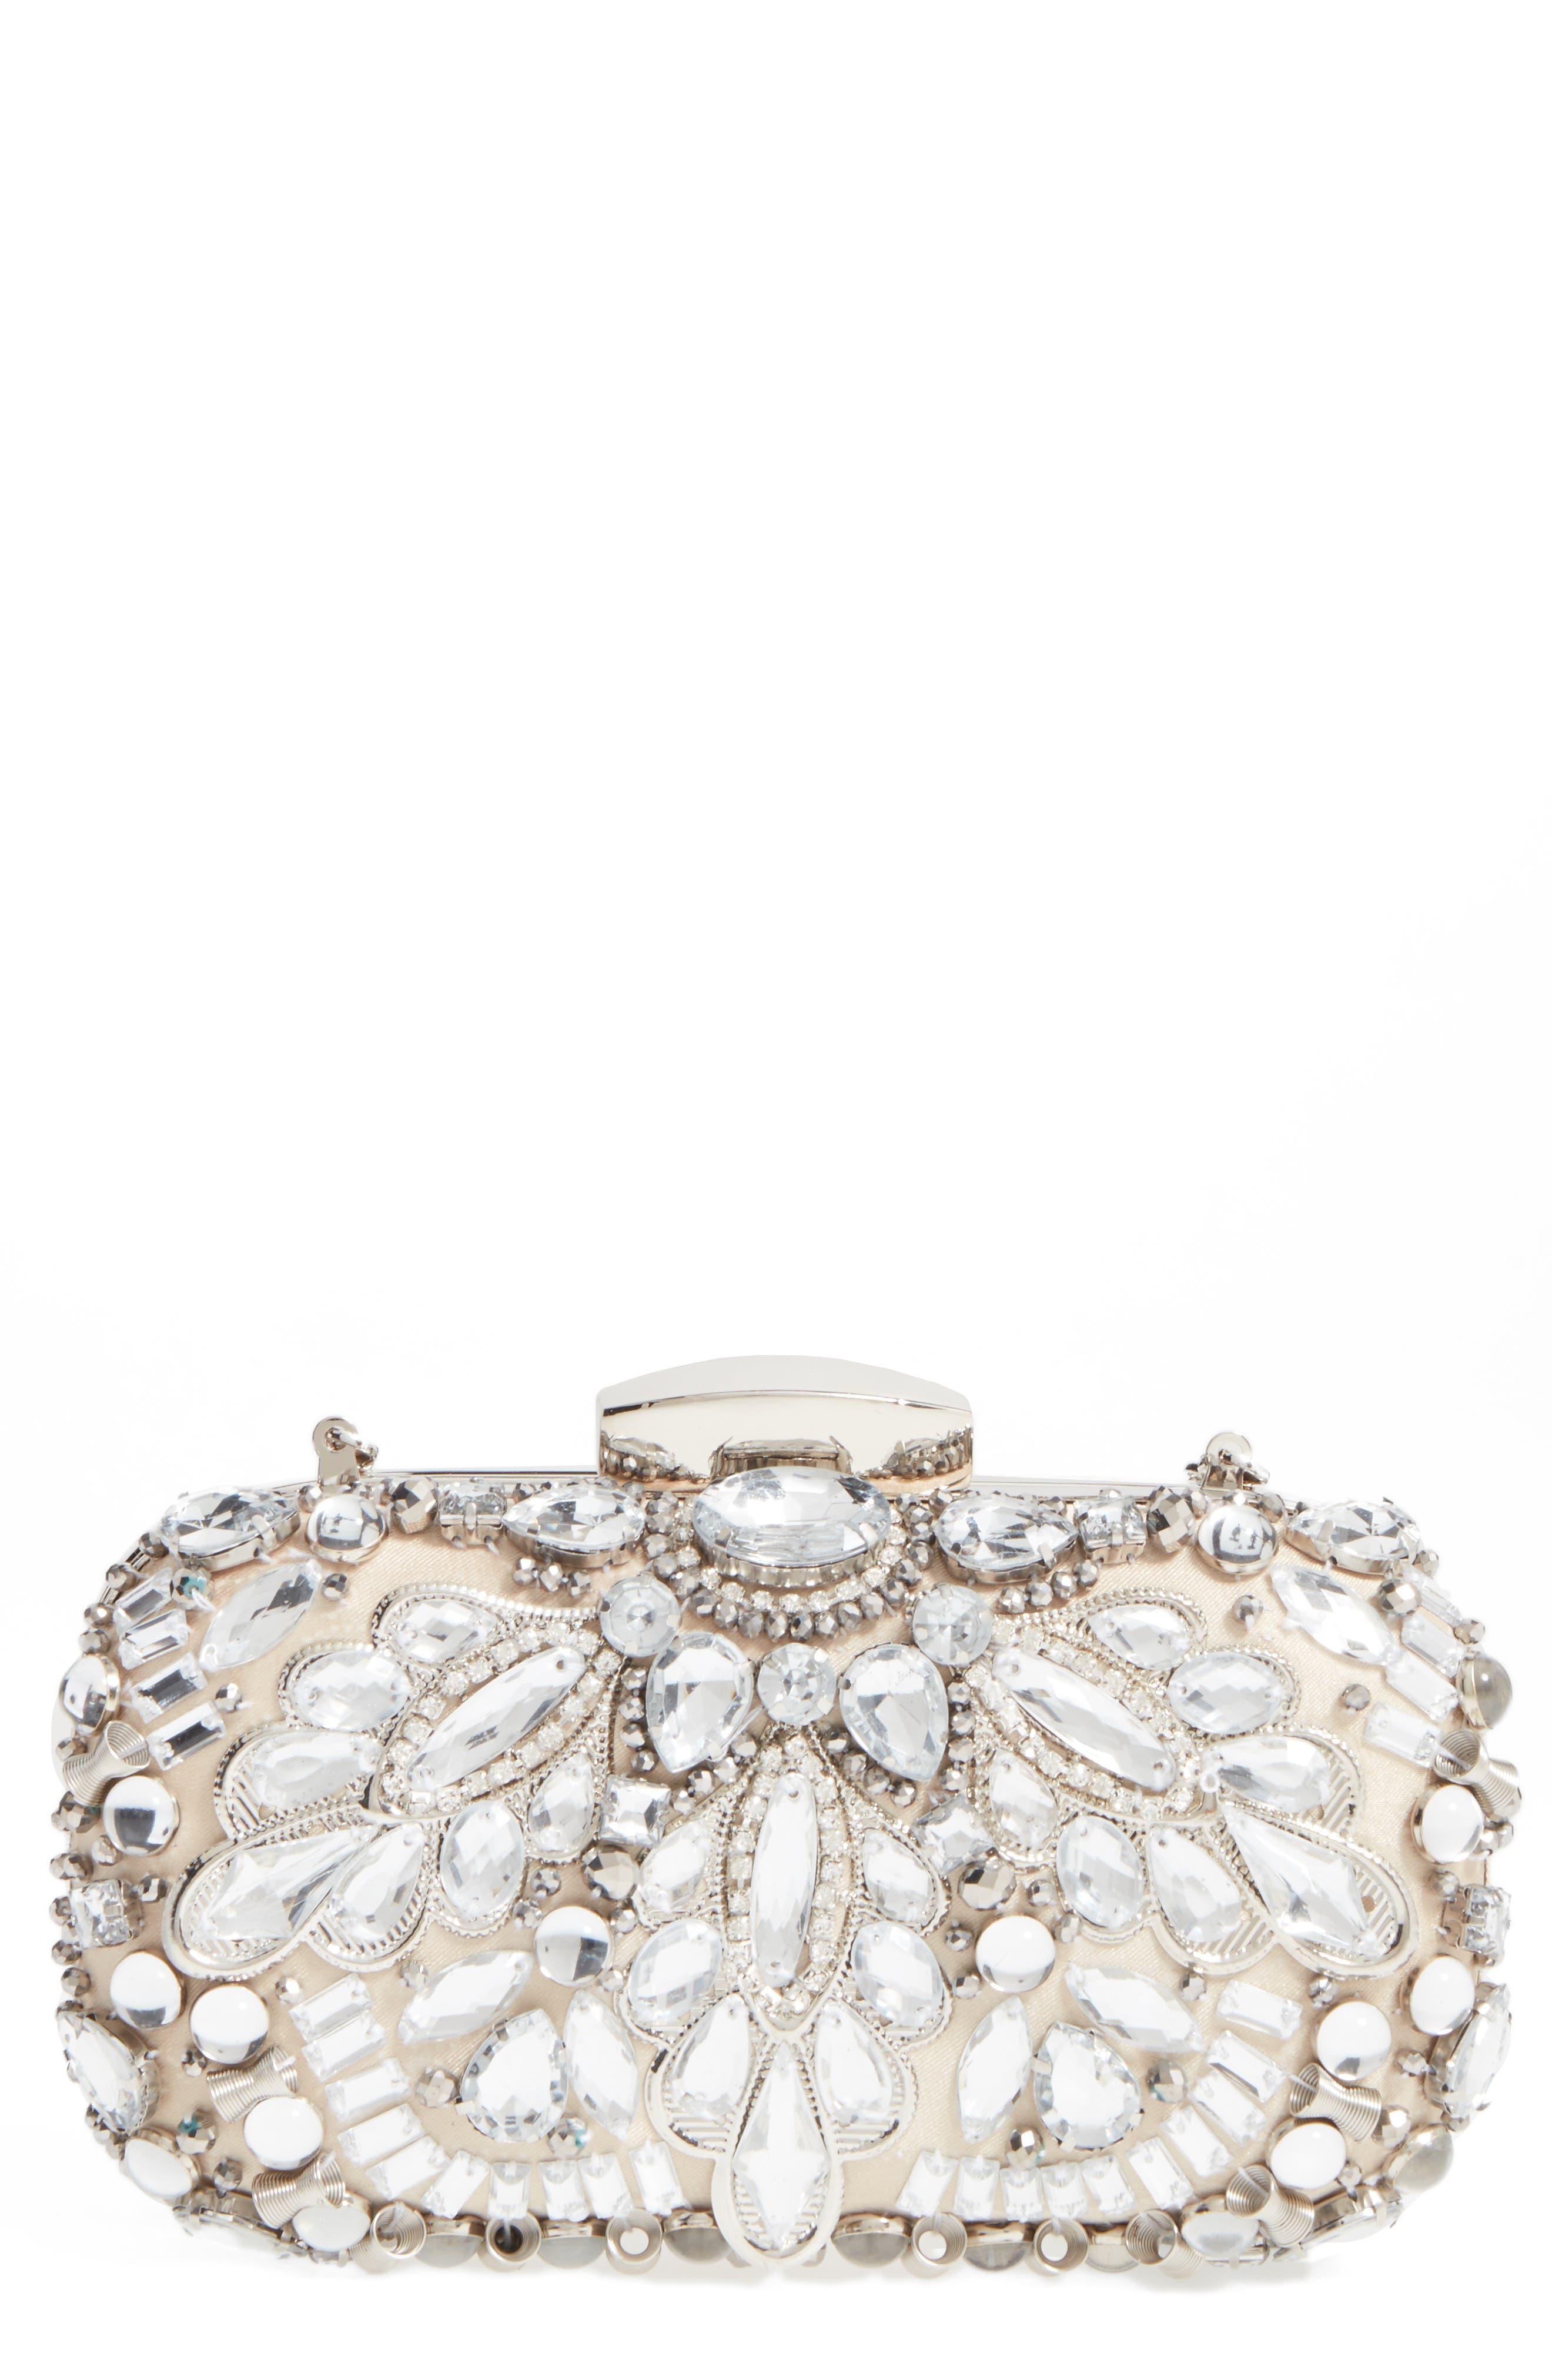 Alternate Image 1 Selected - Natasha Couture Crystal Embellished Frame Clutch